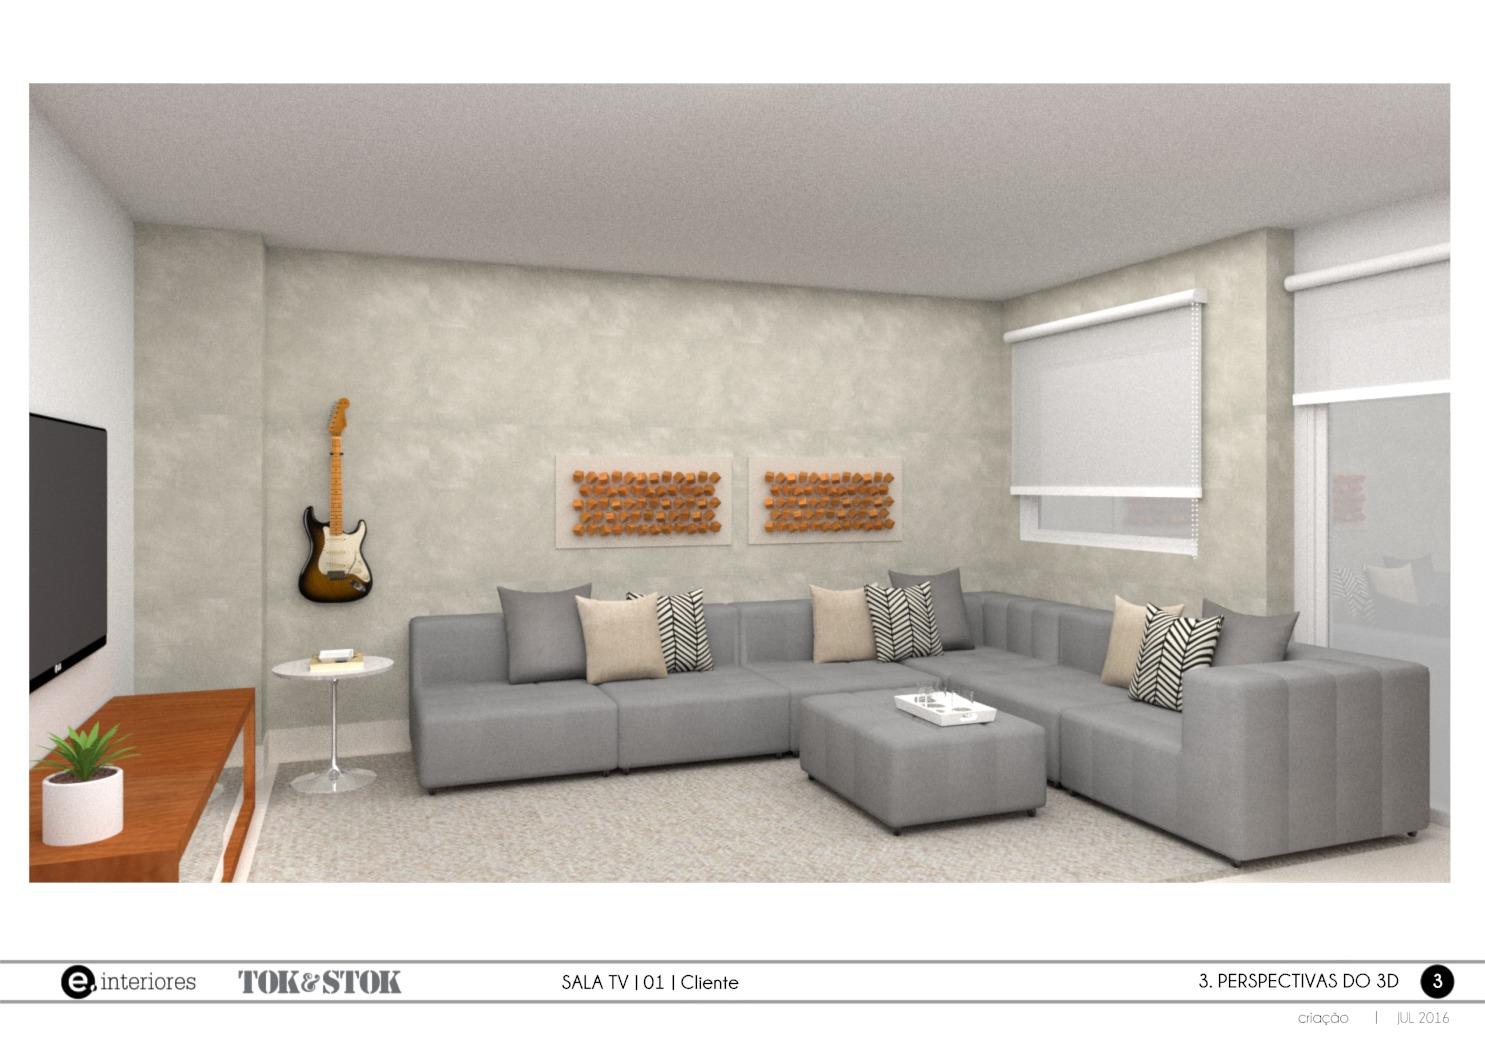 E Interiores: Next Generation Interior Design With Blender